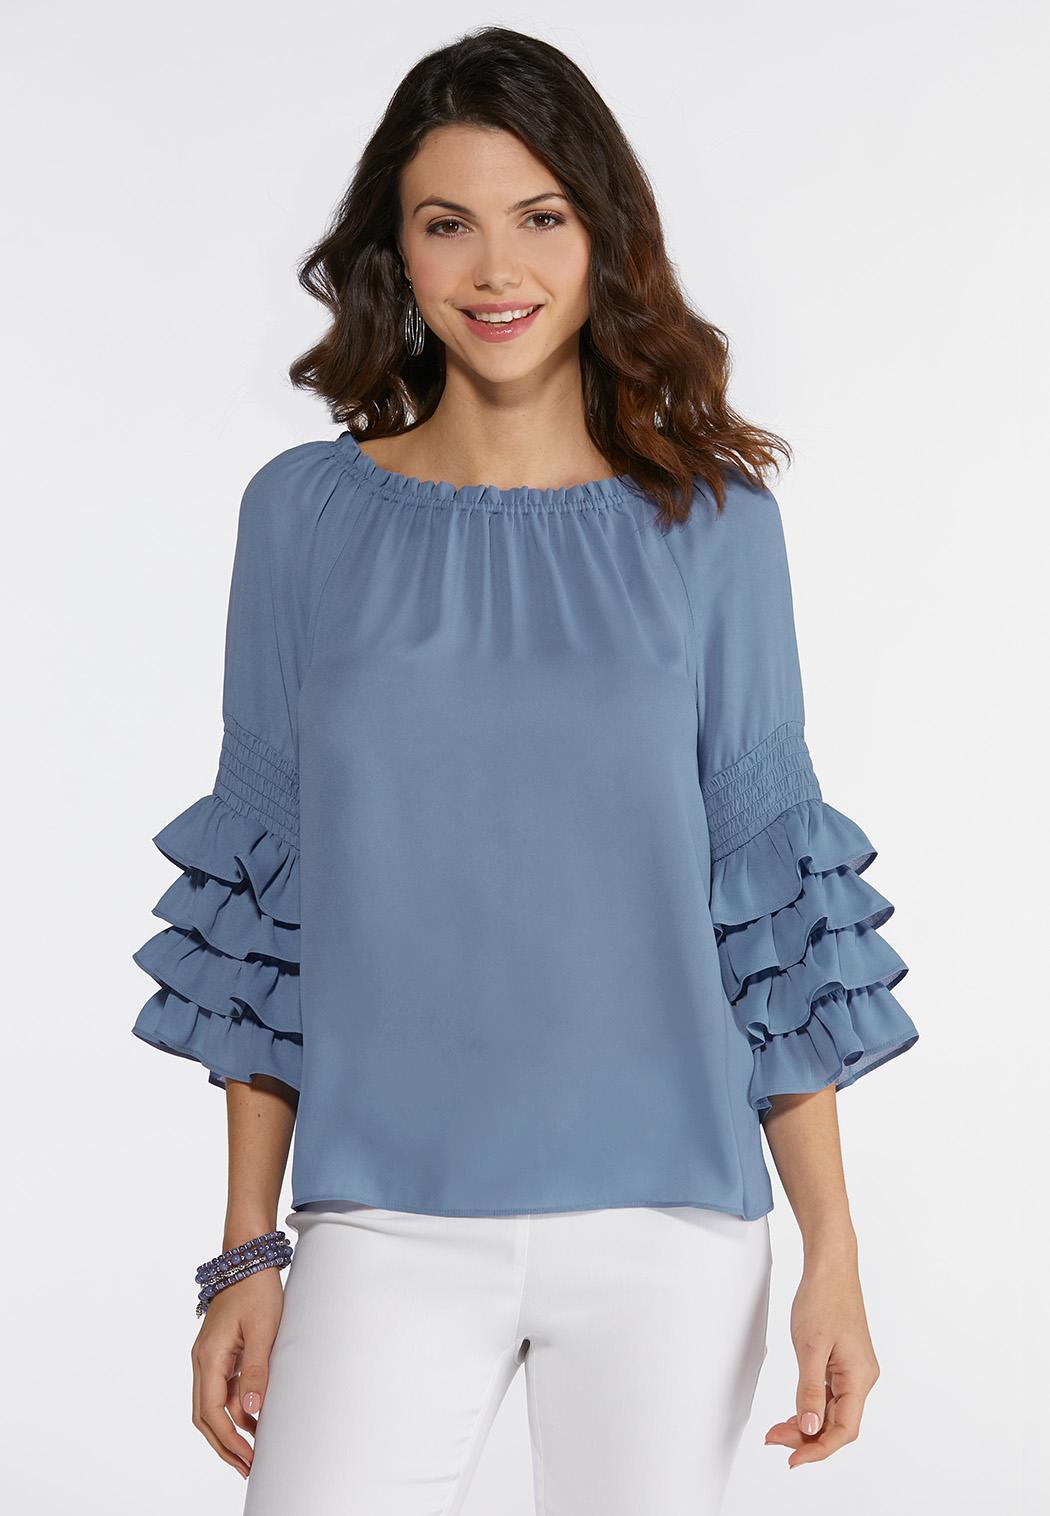 ac27811cd7cfc Women s Shirts   Blouses